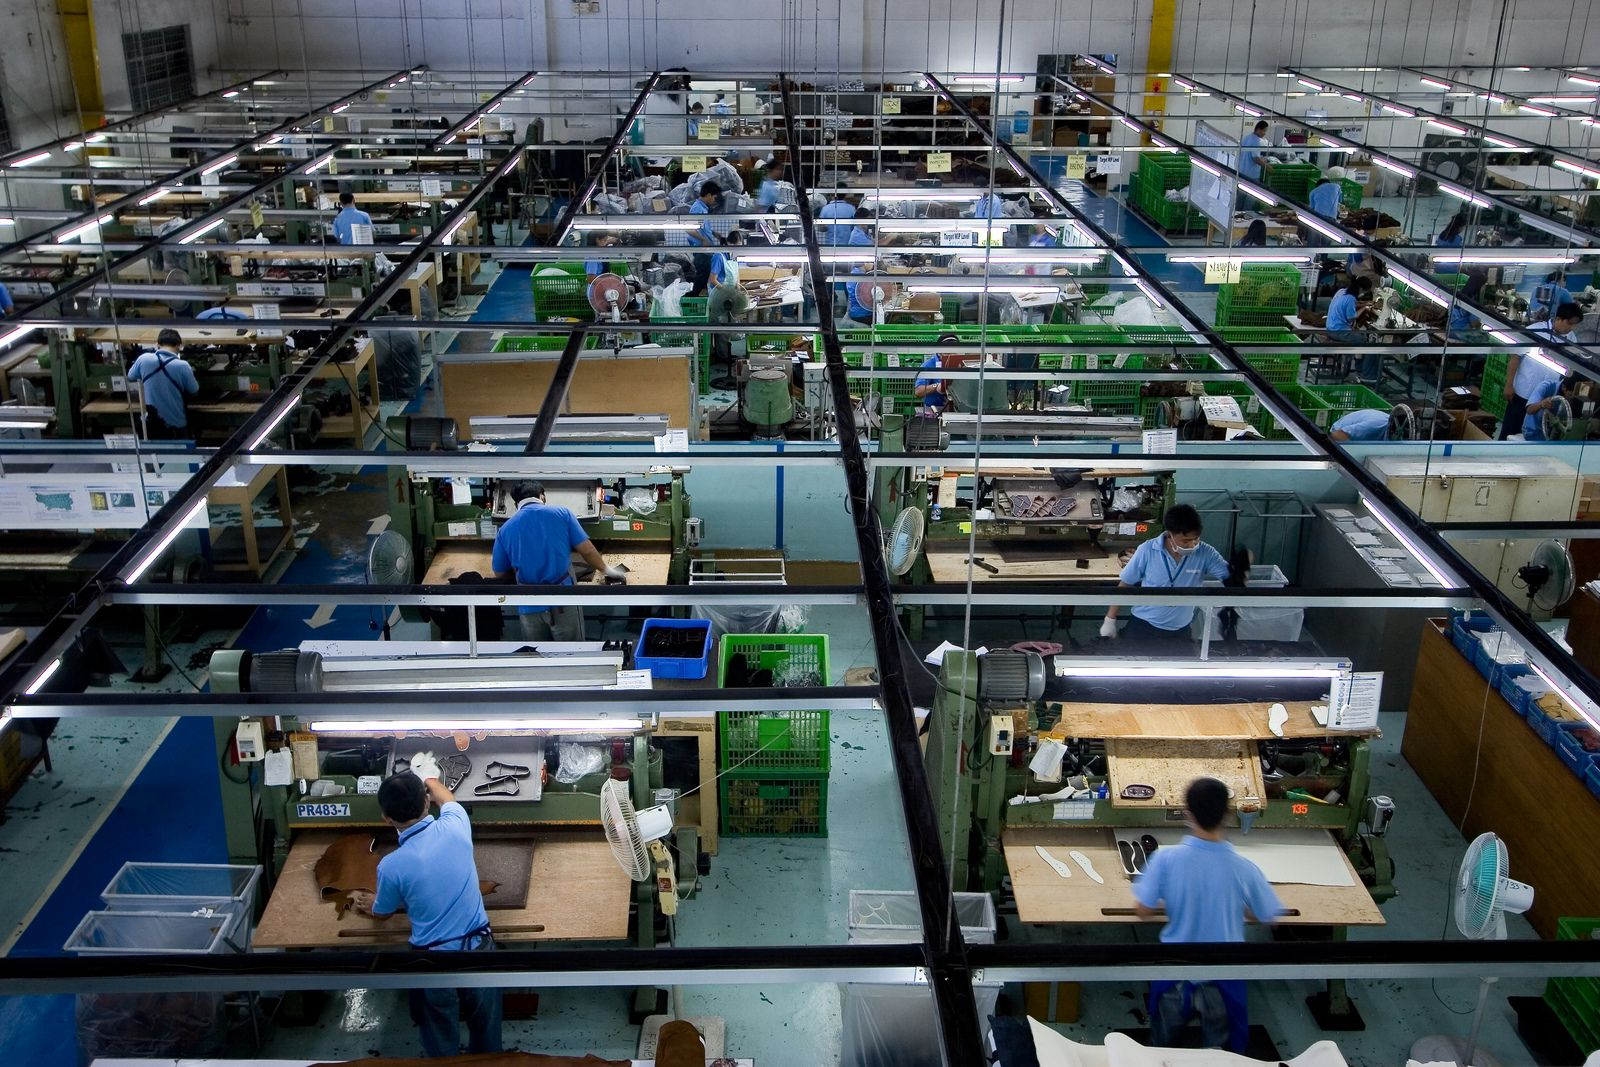 Iron & steel mills & steel product manufacturing | Data USA